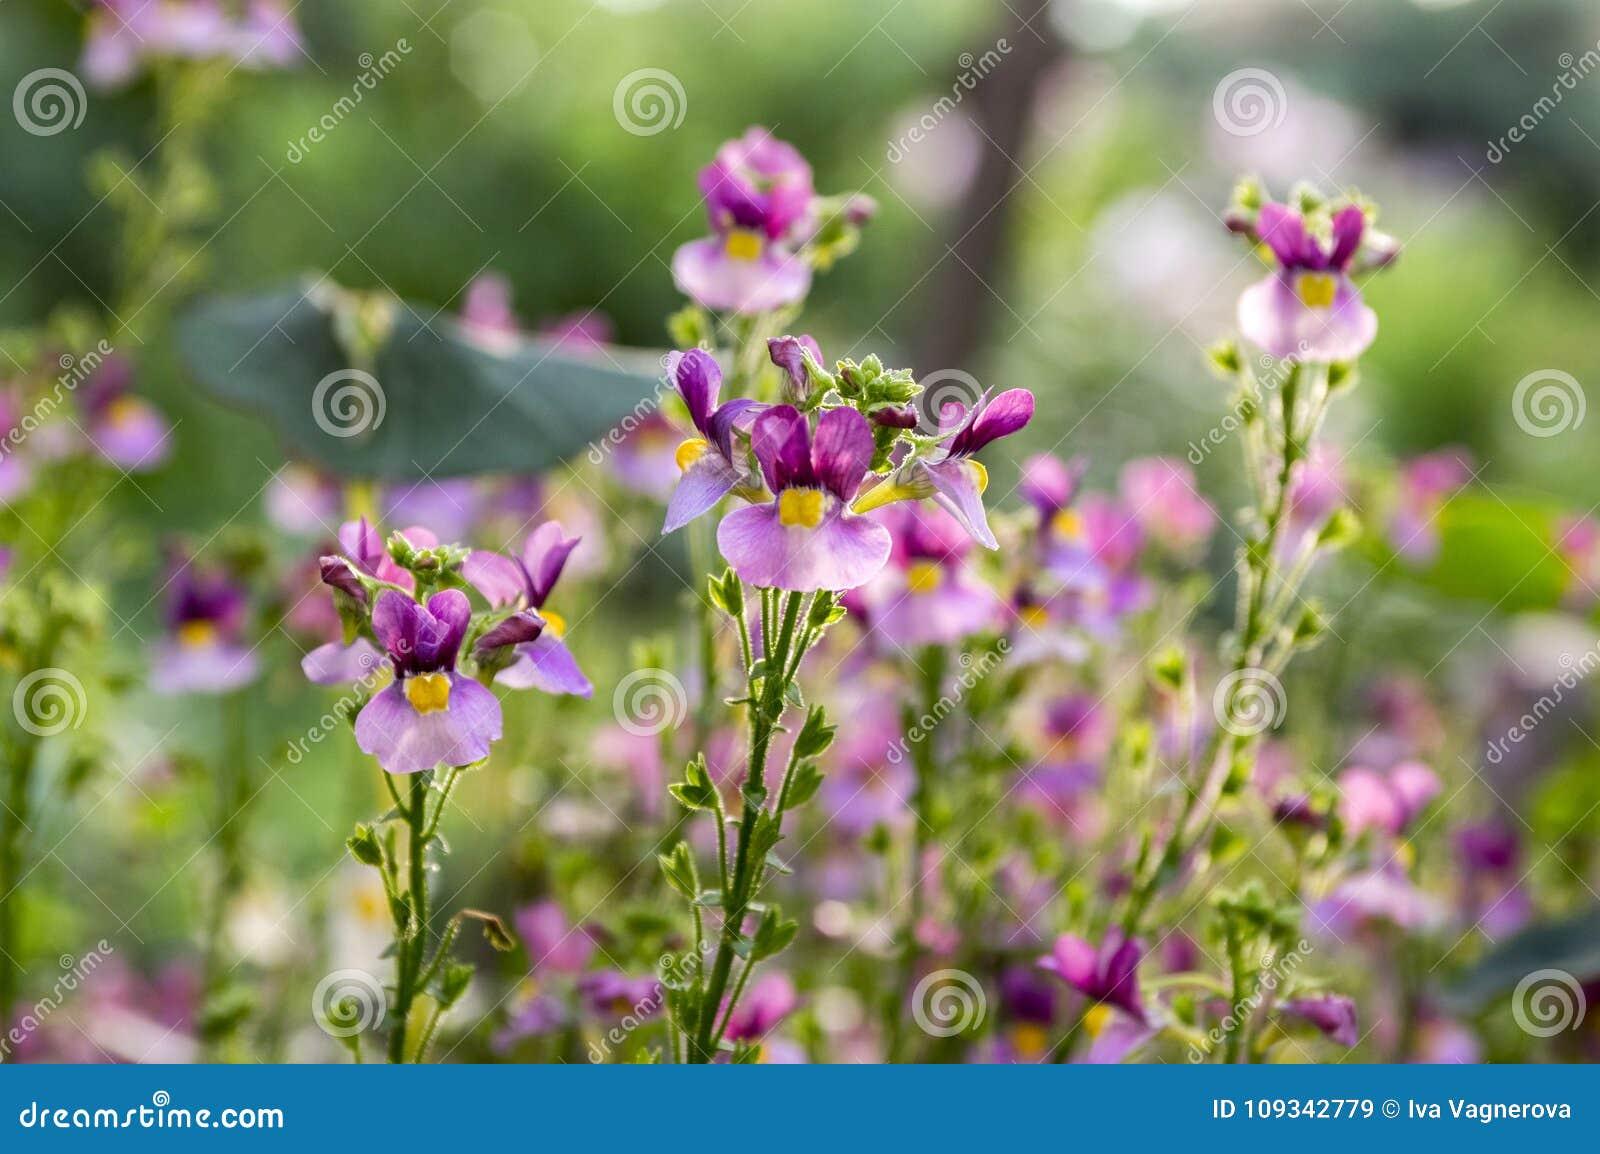 Nemesia Strumosa Ornamental Flowers In Bloom Purple Violet With